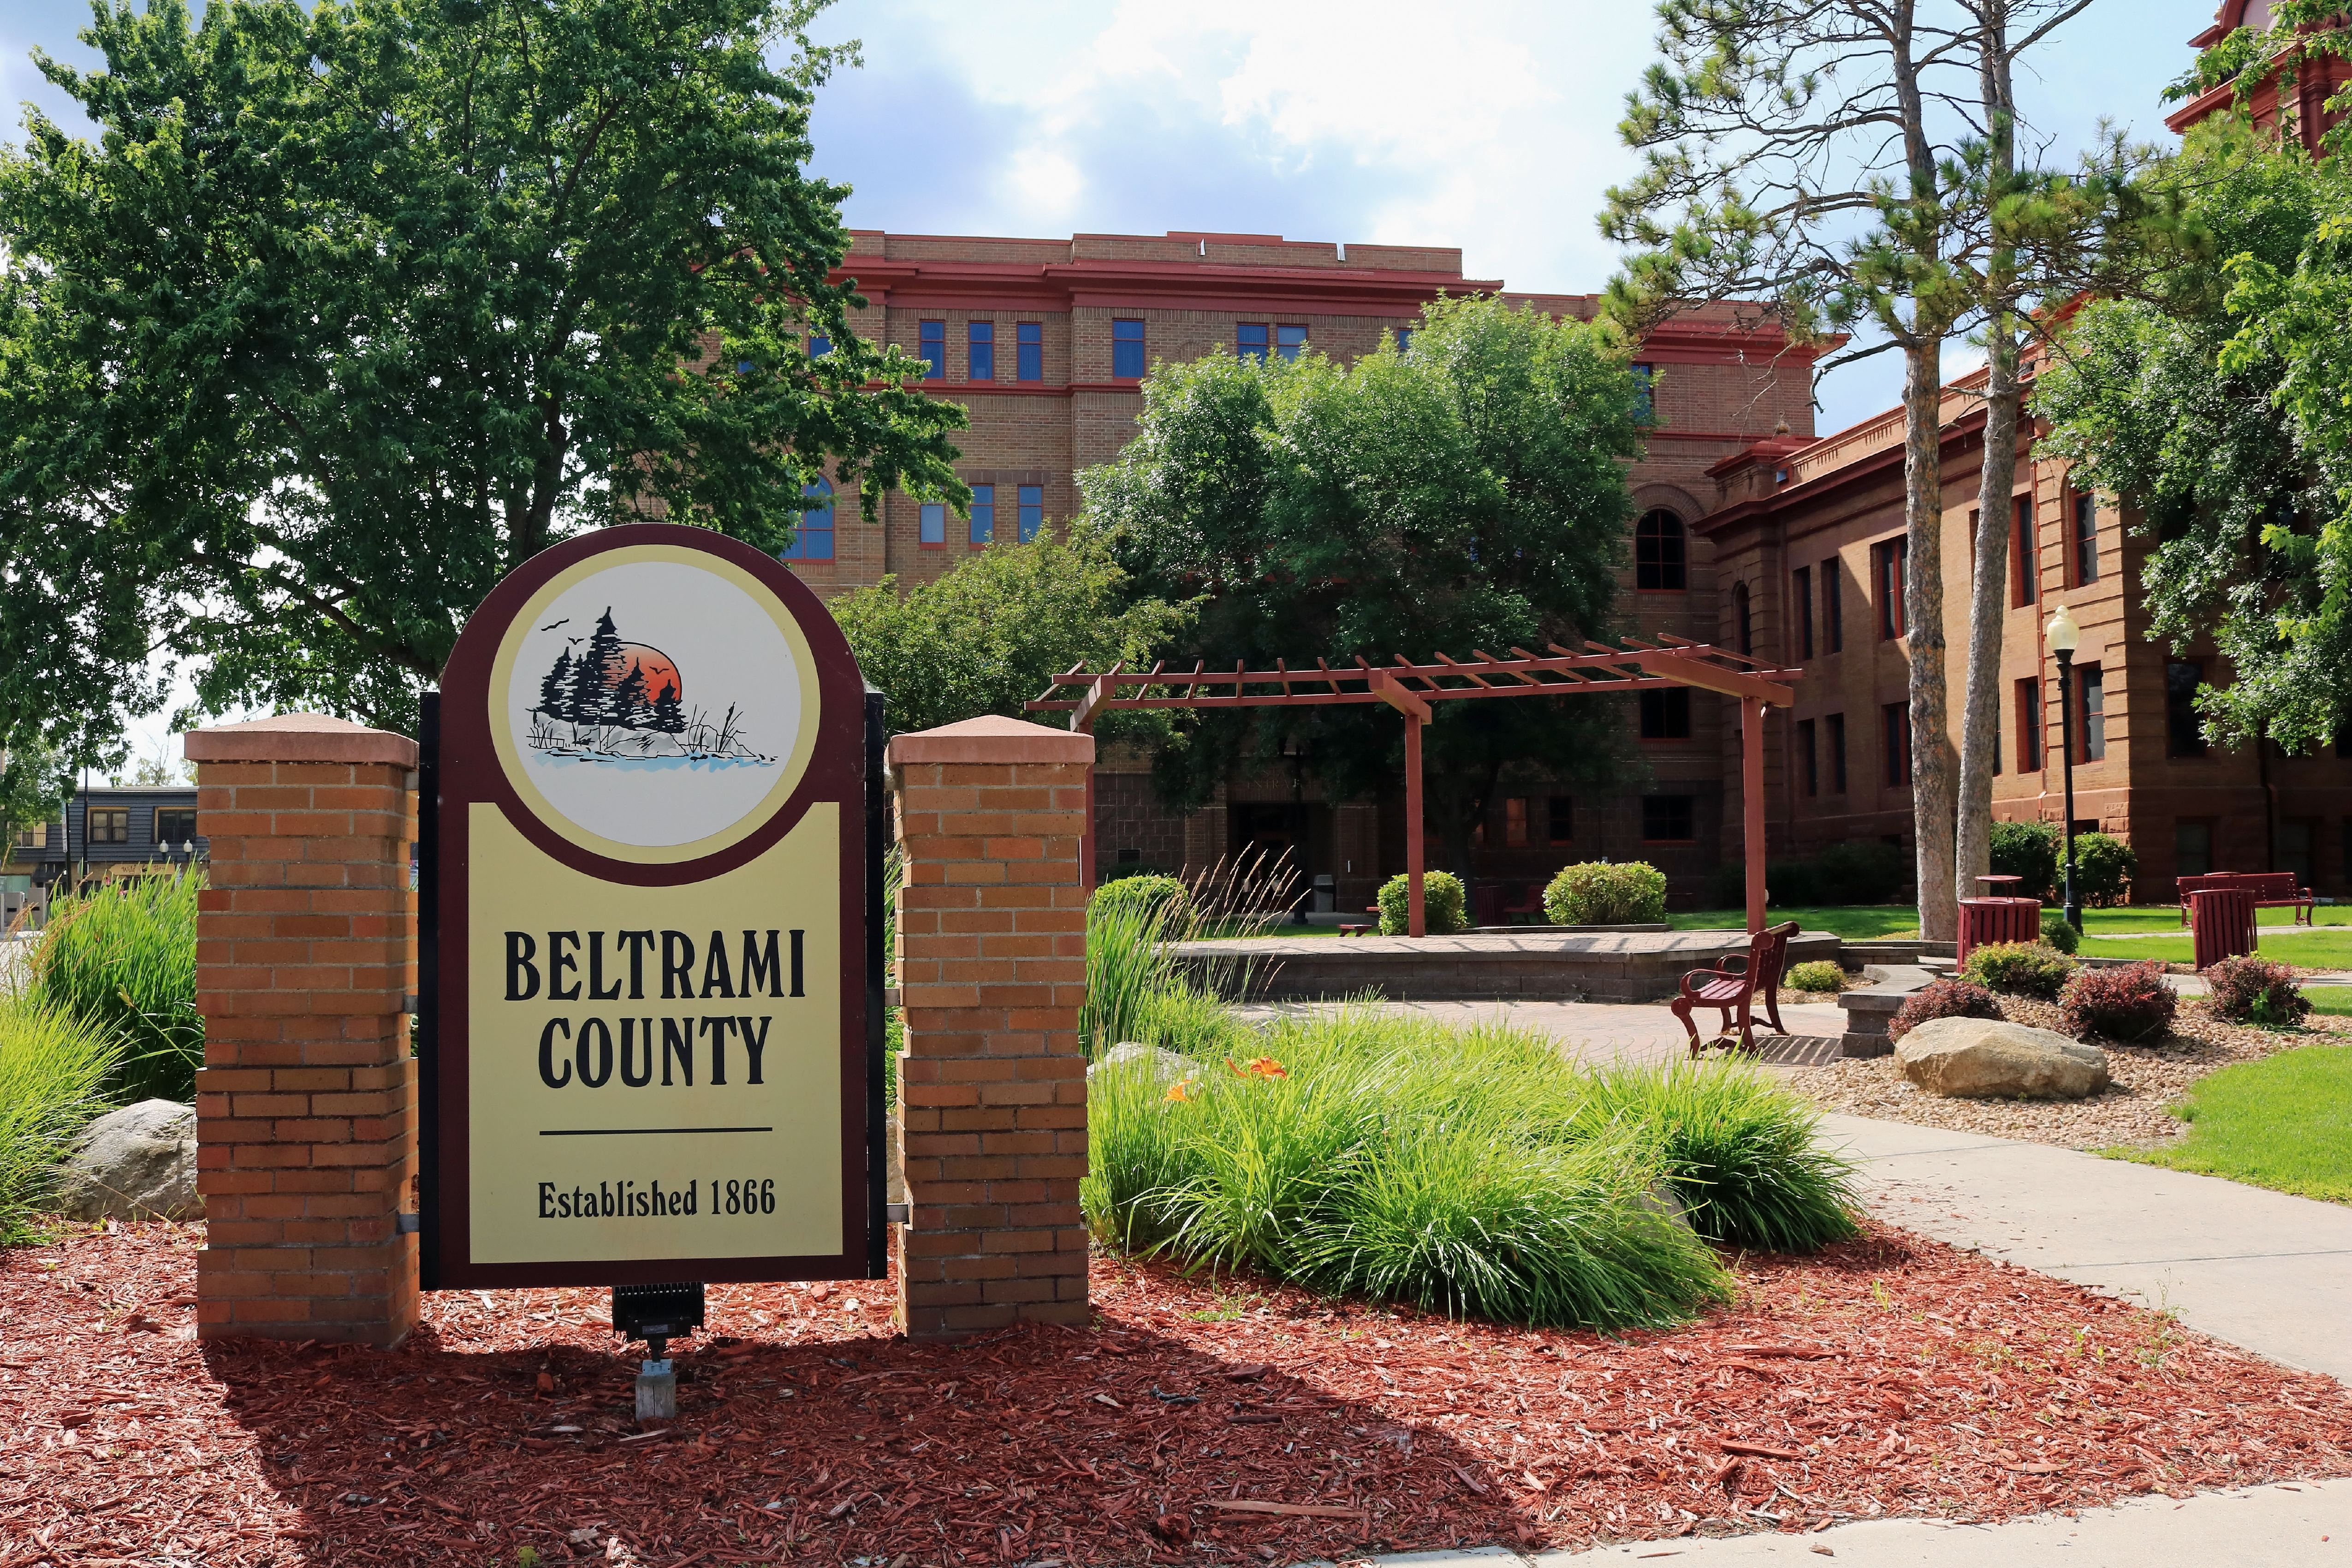 The Beltrami County courthouse in Bemidji, Minnesota.